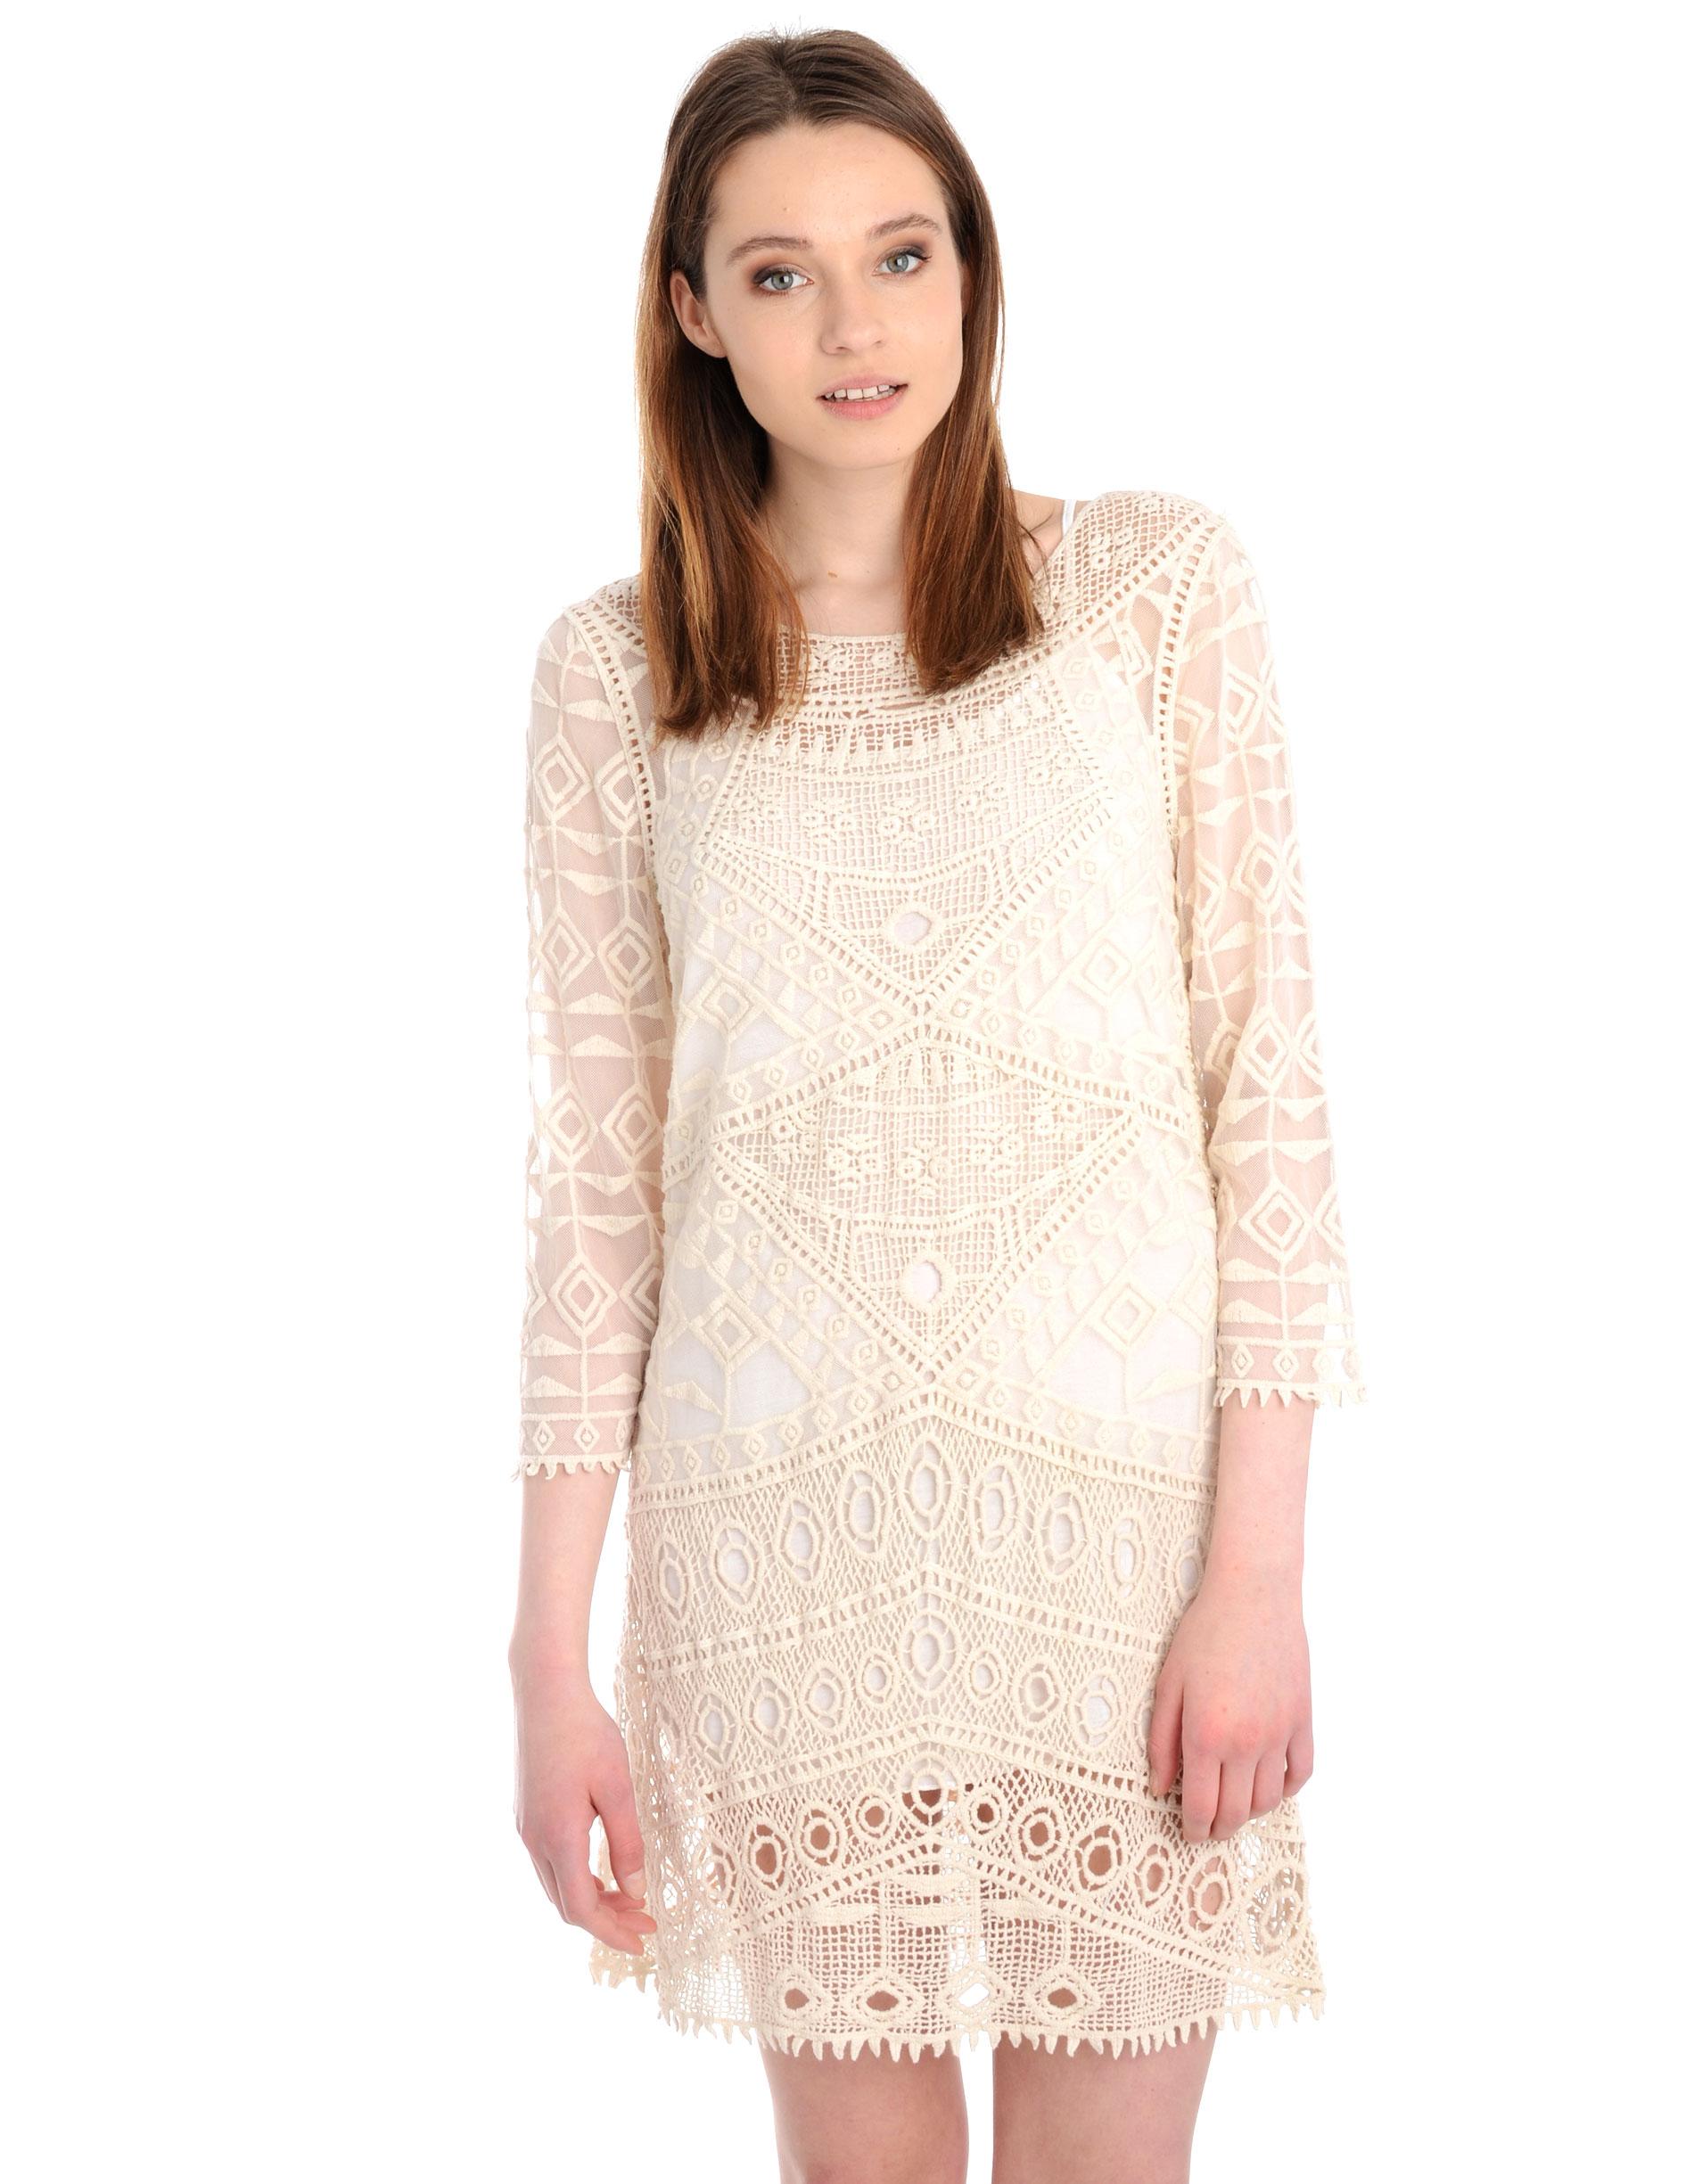 Sukienka - 54-6227 BEIGE - Unisono